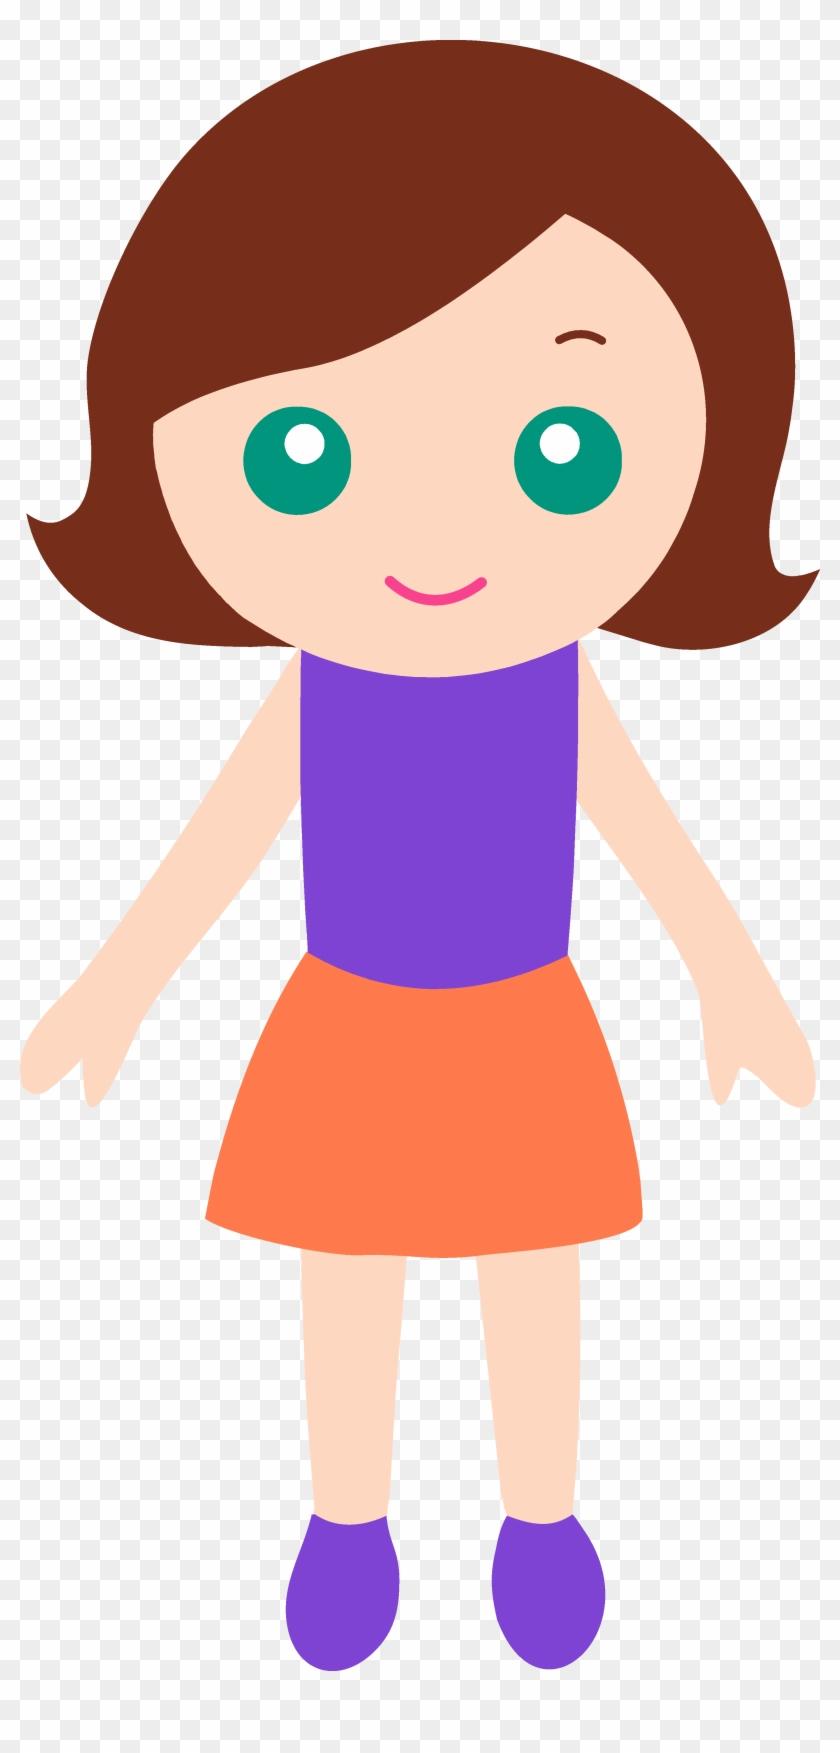 Clipart Of Little Girl Clip Art Many Interesting Cliparts - Clip Art #141089